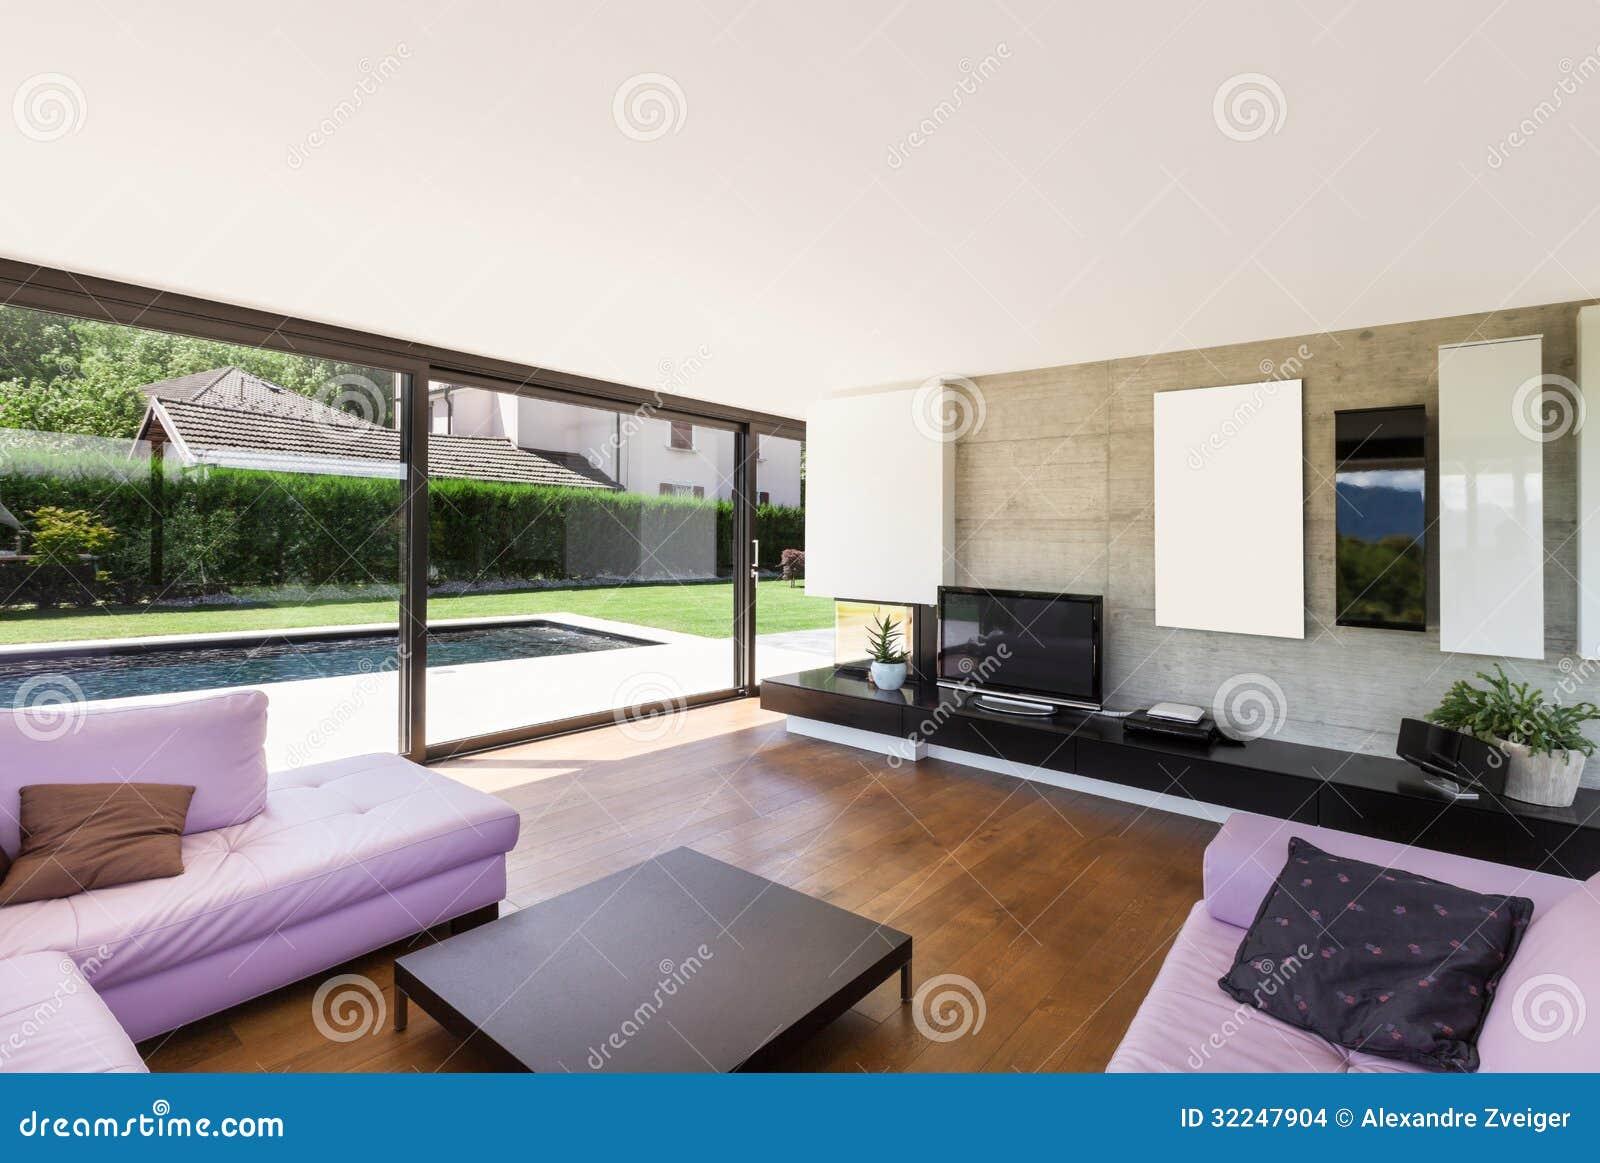 Chalet moderno interior sala de estar imagenes de archivo imagen 32247904 - Fotos chalets modernos ...